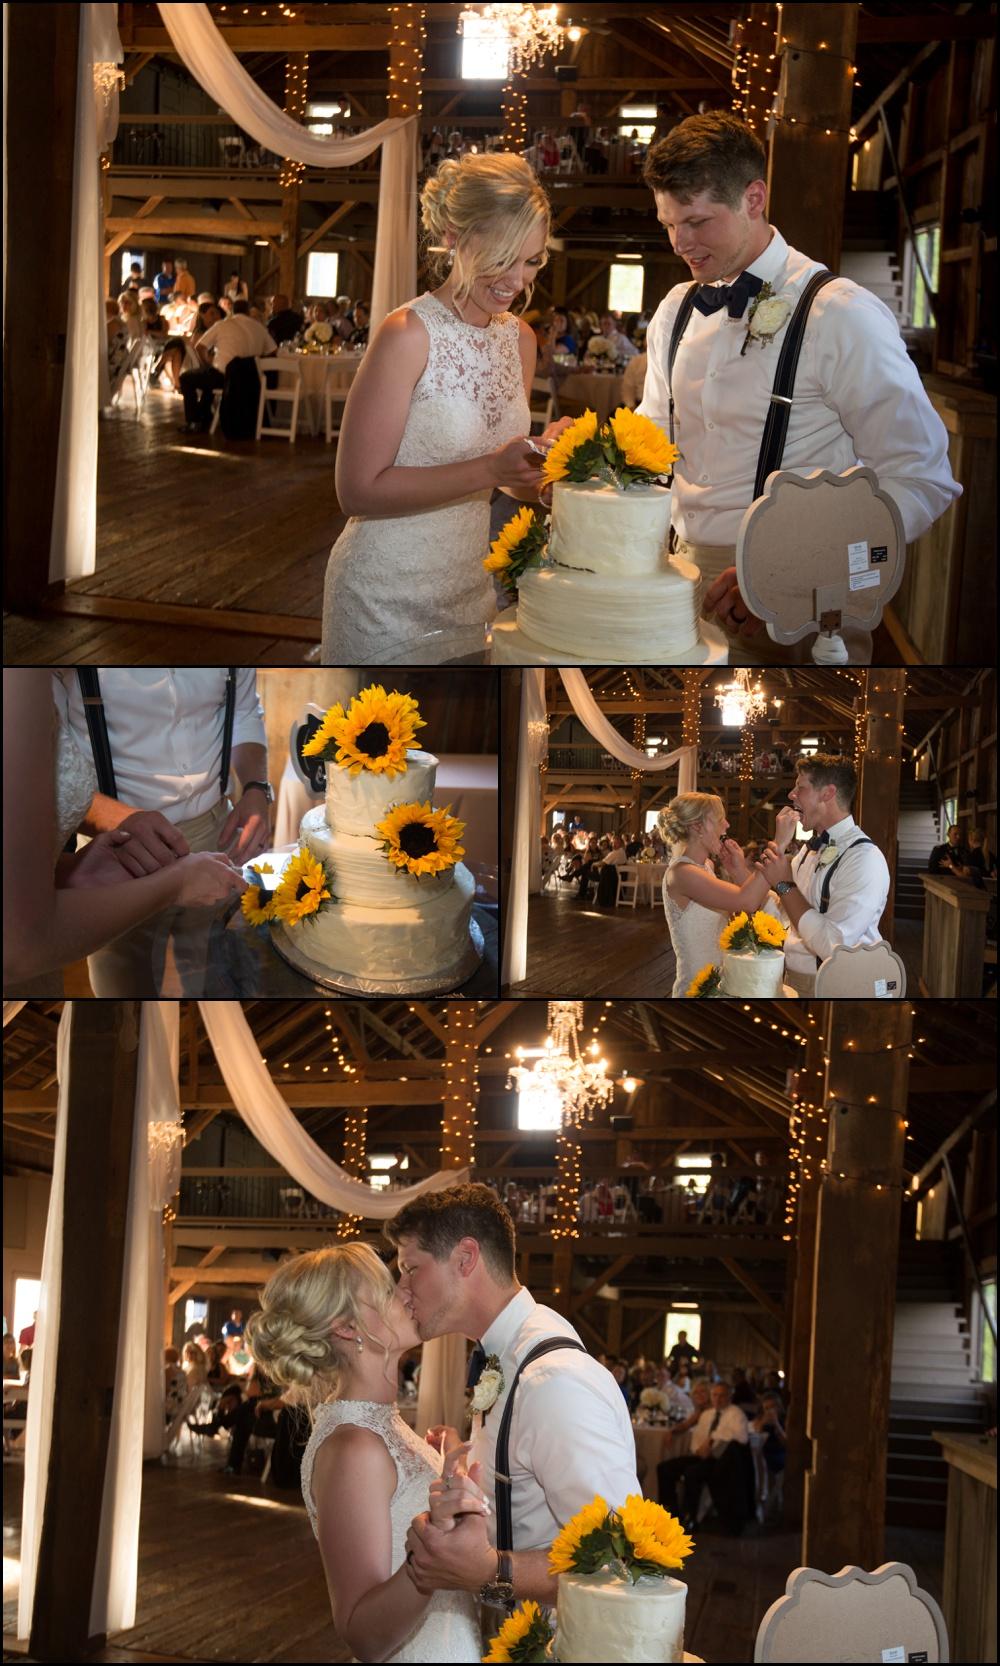 Mustard Seed Garden Wedding Pictures-030.jpg